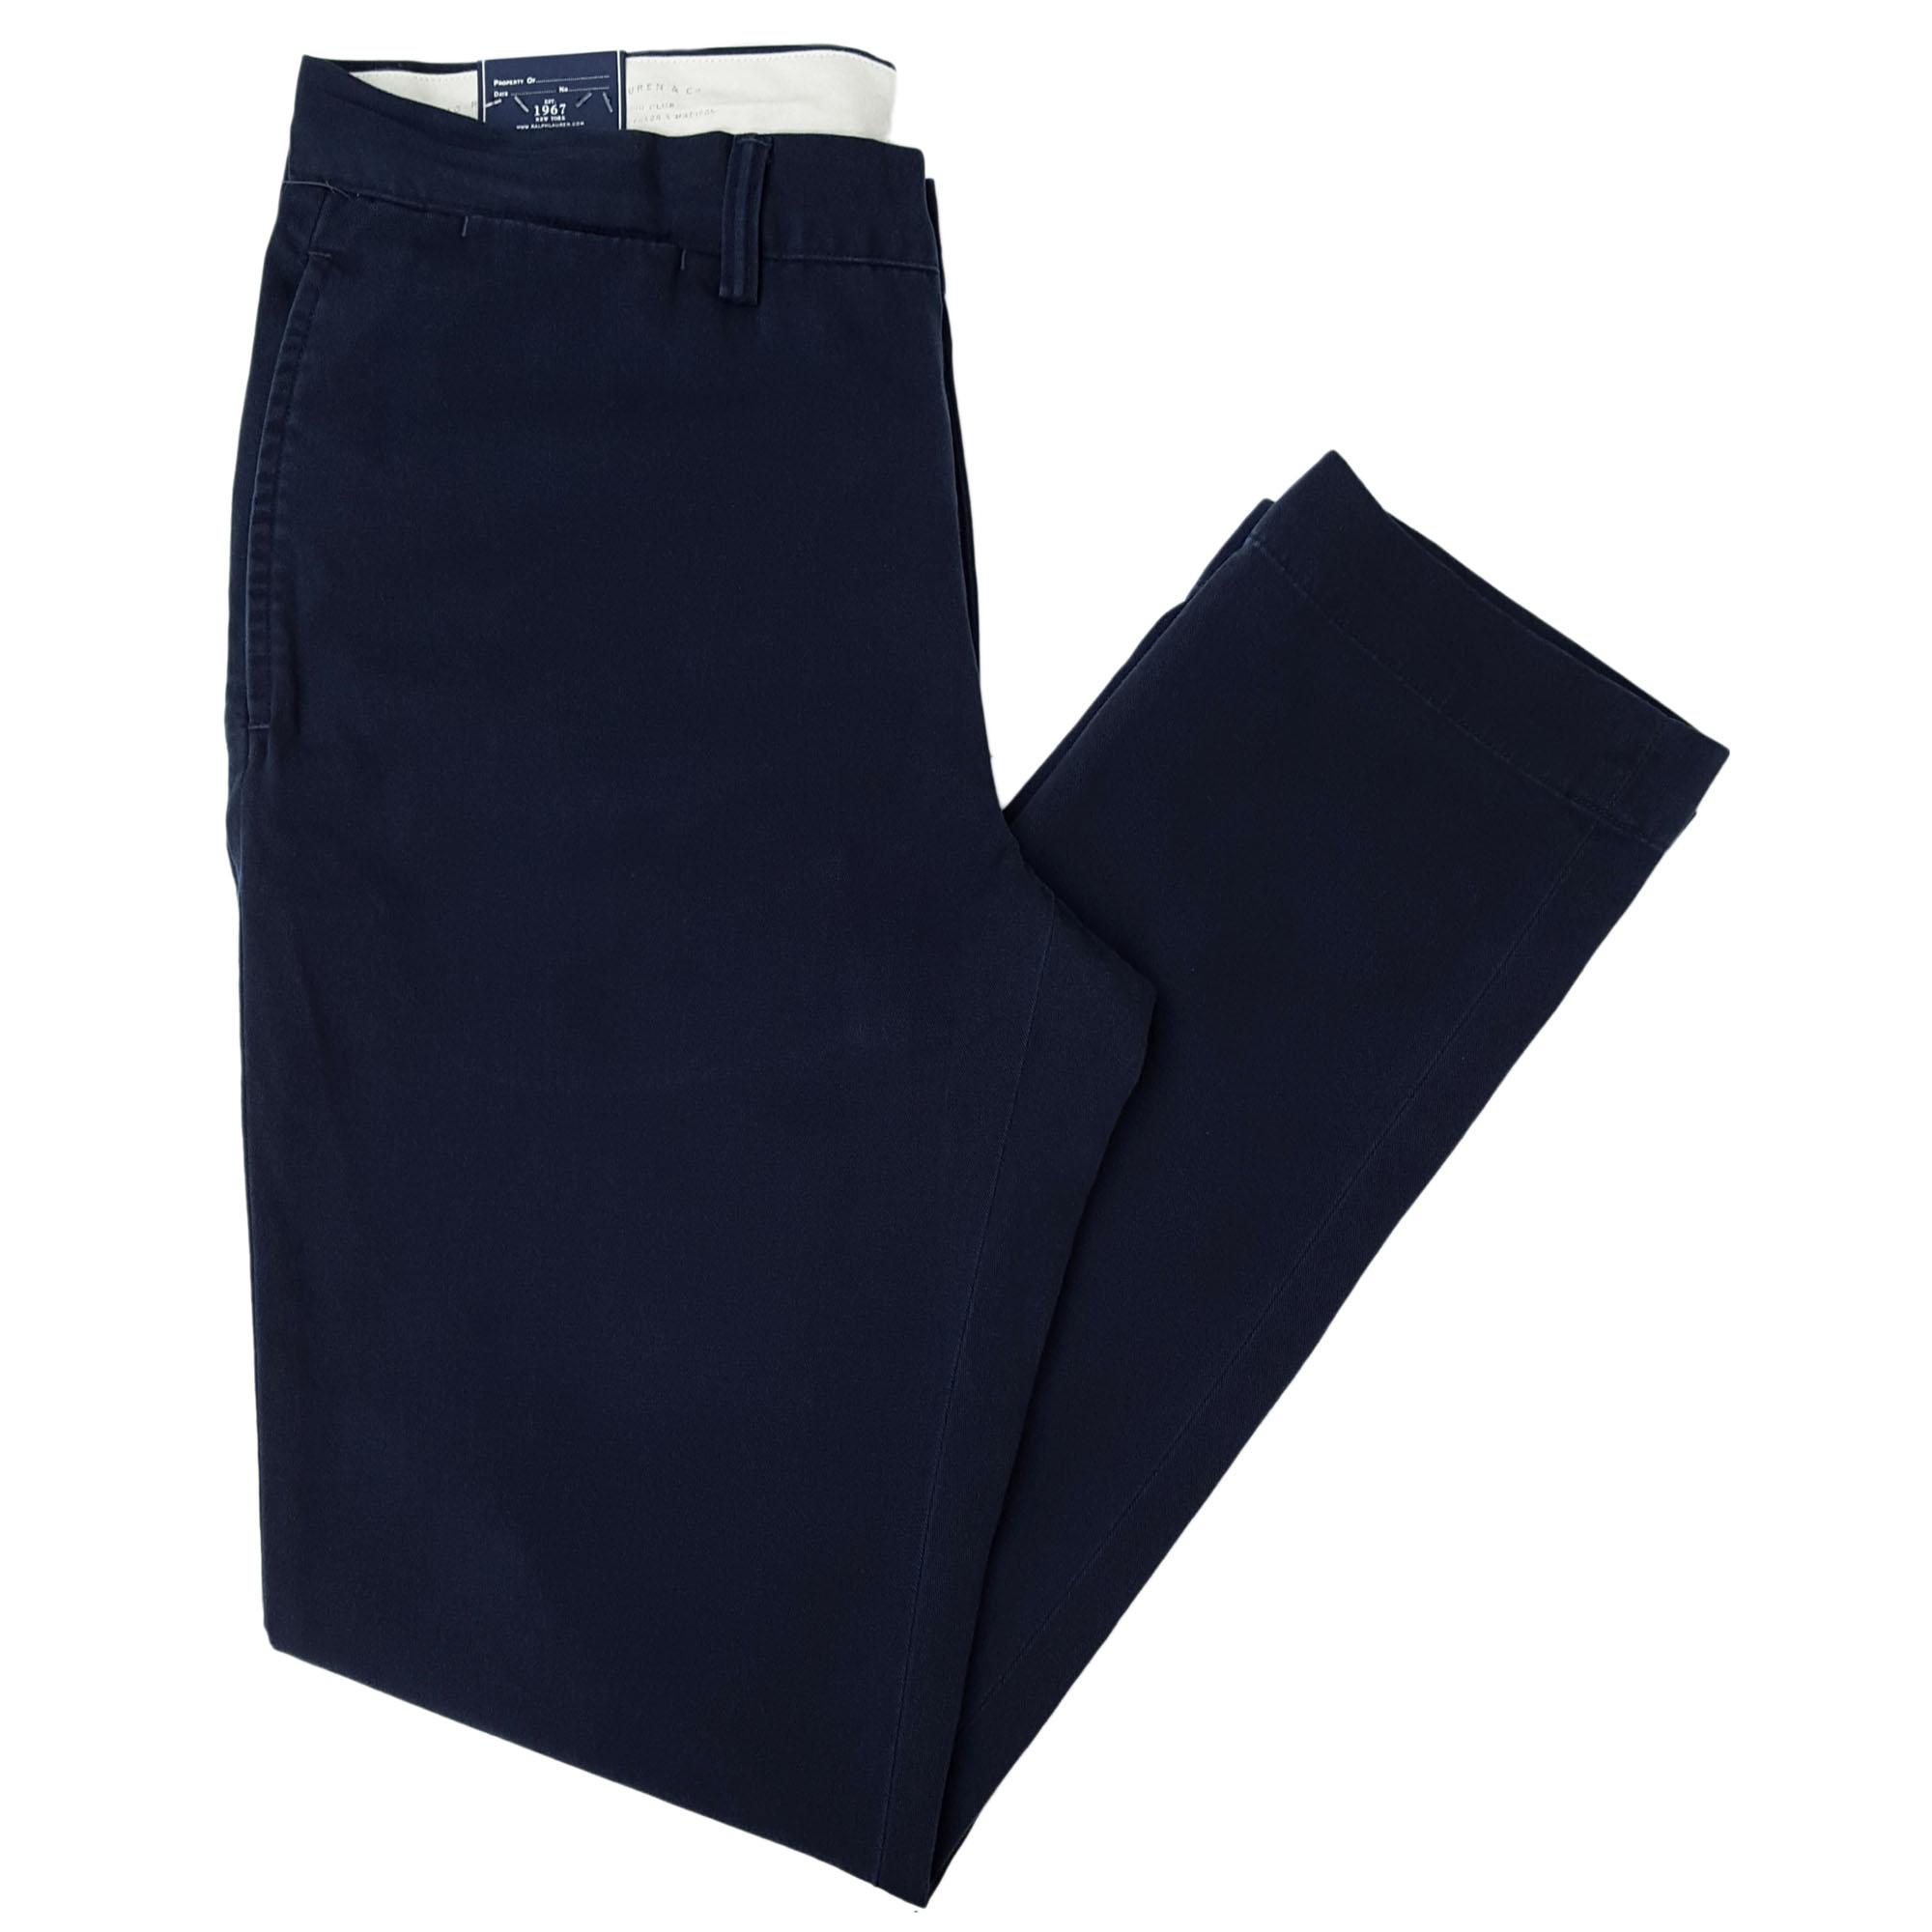 Polo Ralph Lauren Men/'s Slim-Fit Bedford Chino Pants